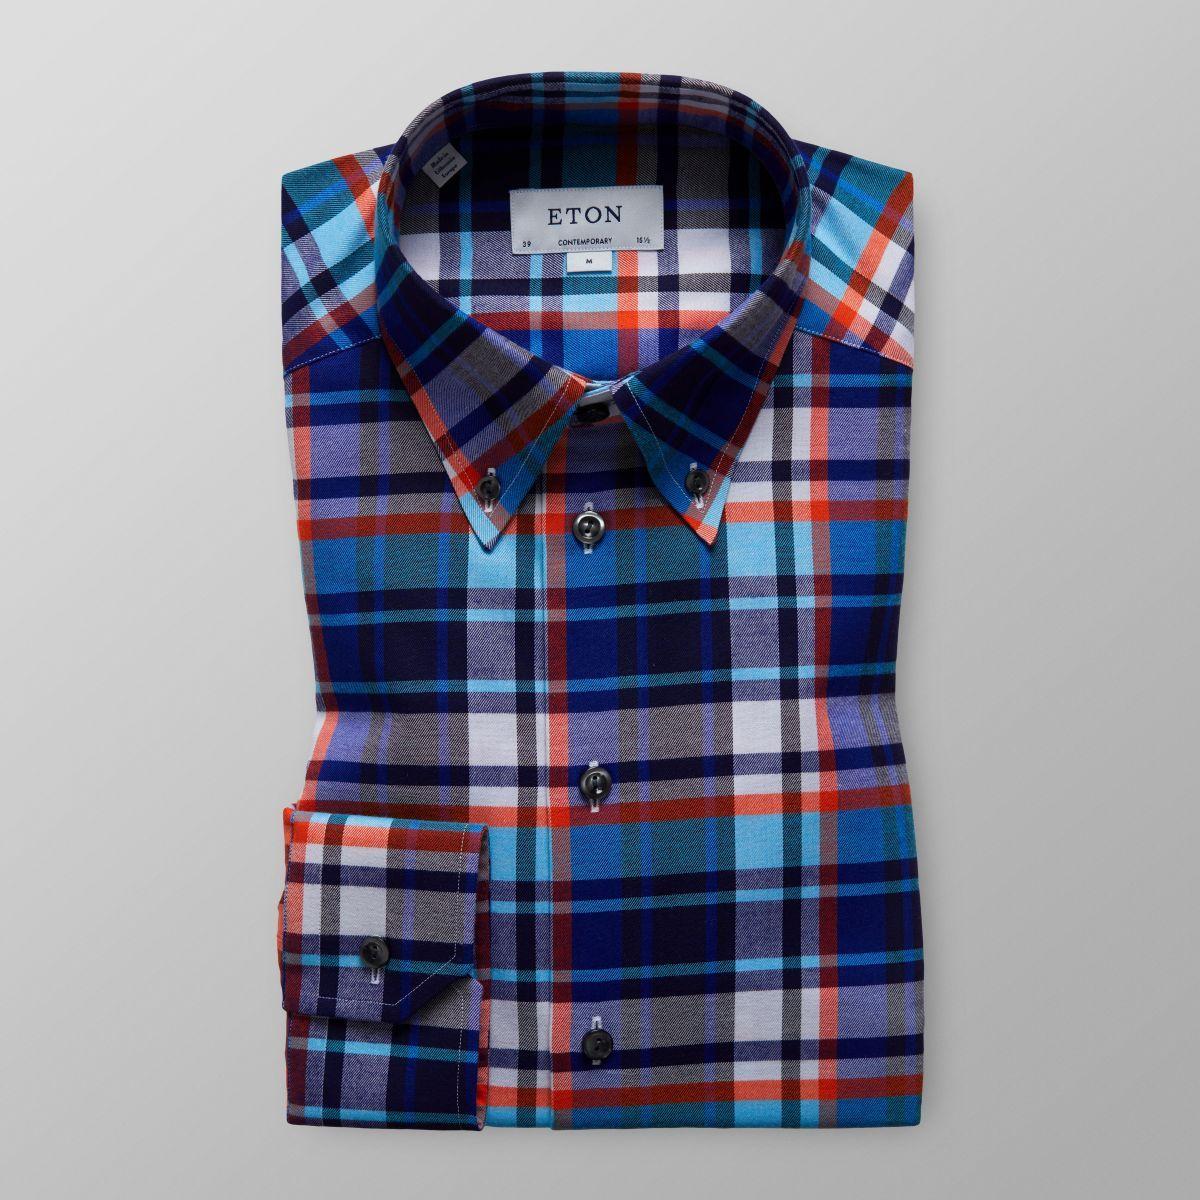 f448513b92 Bold Check Button-Down Shirt   Eton Shirts UK   Weaving patterns ...